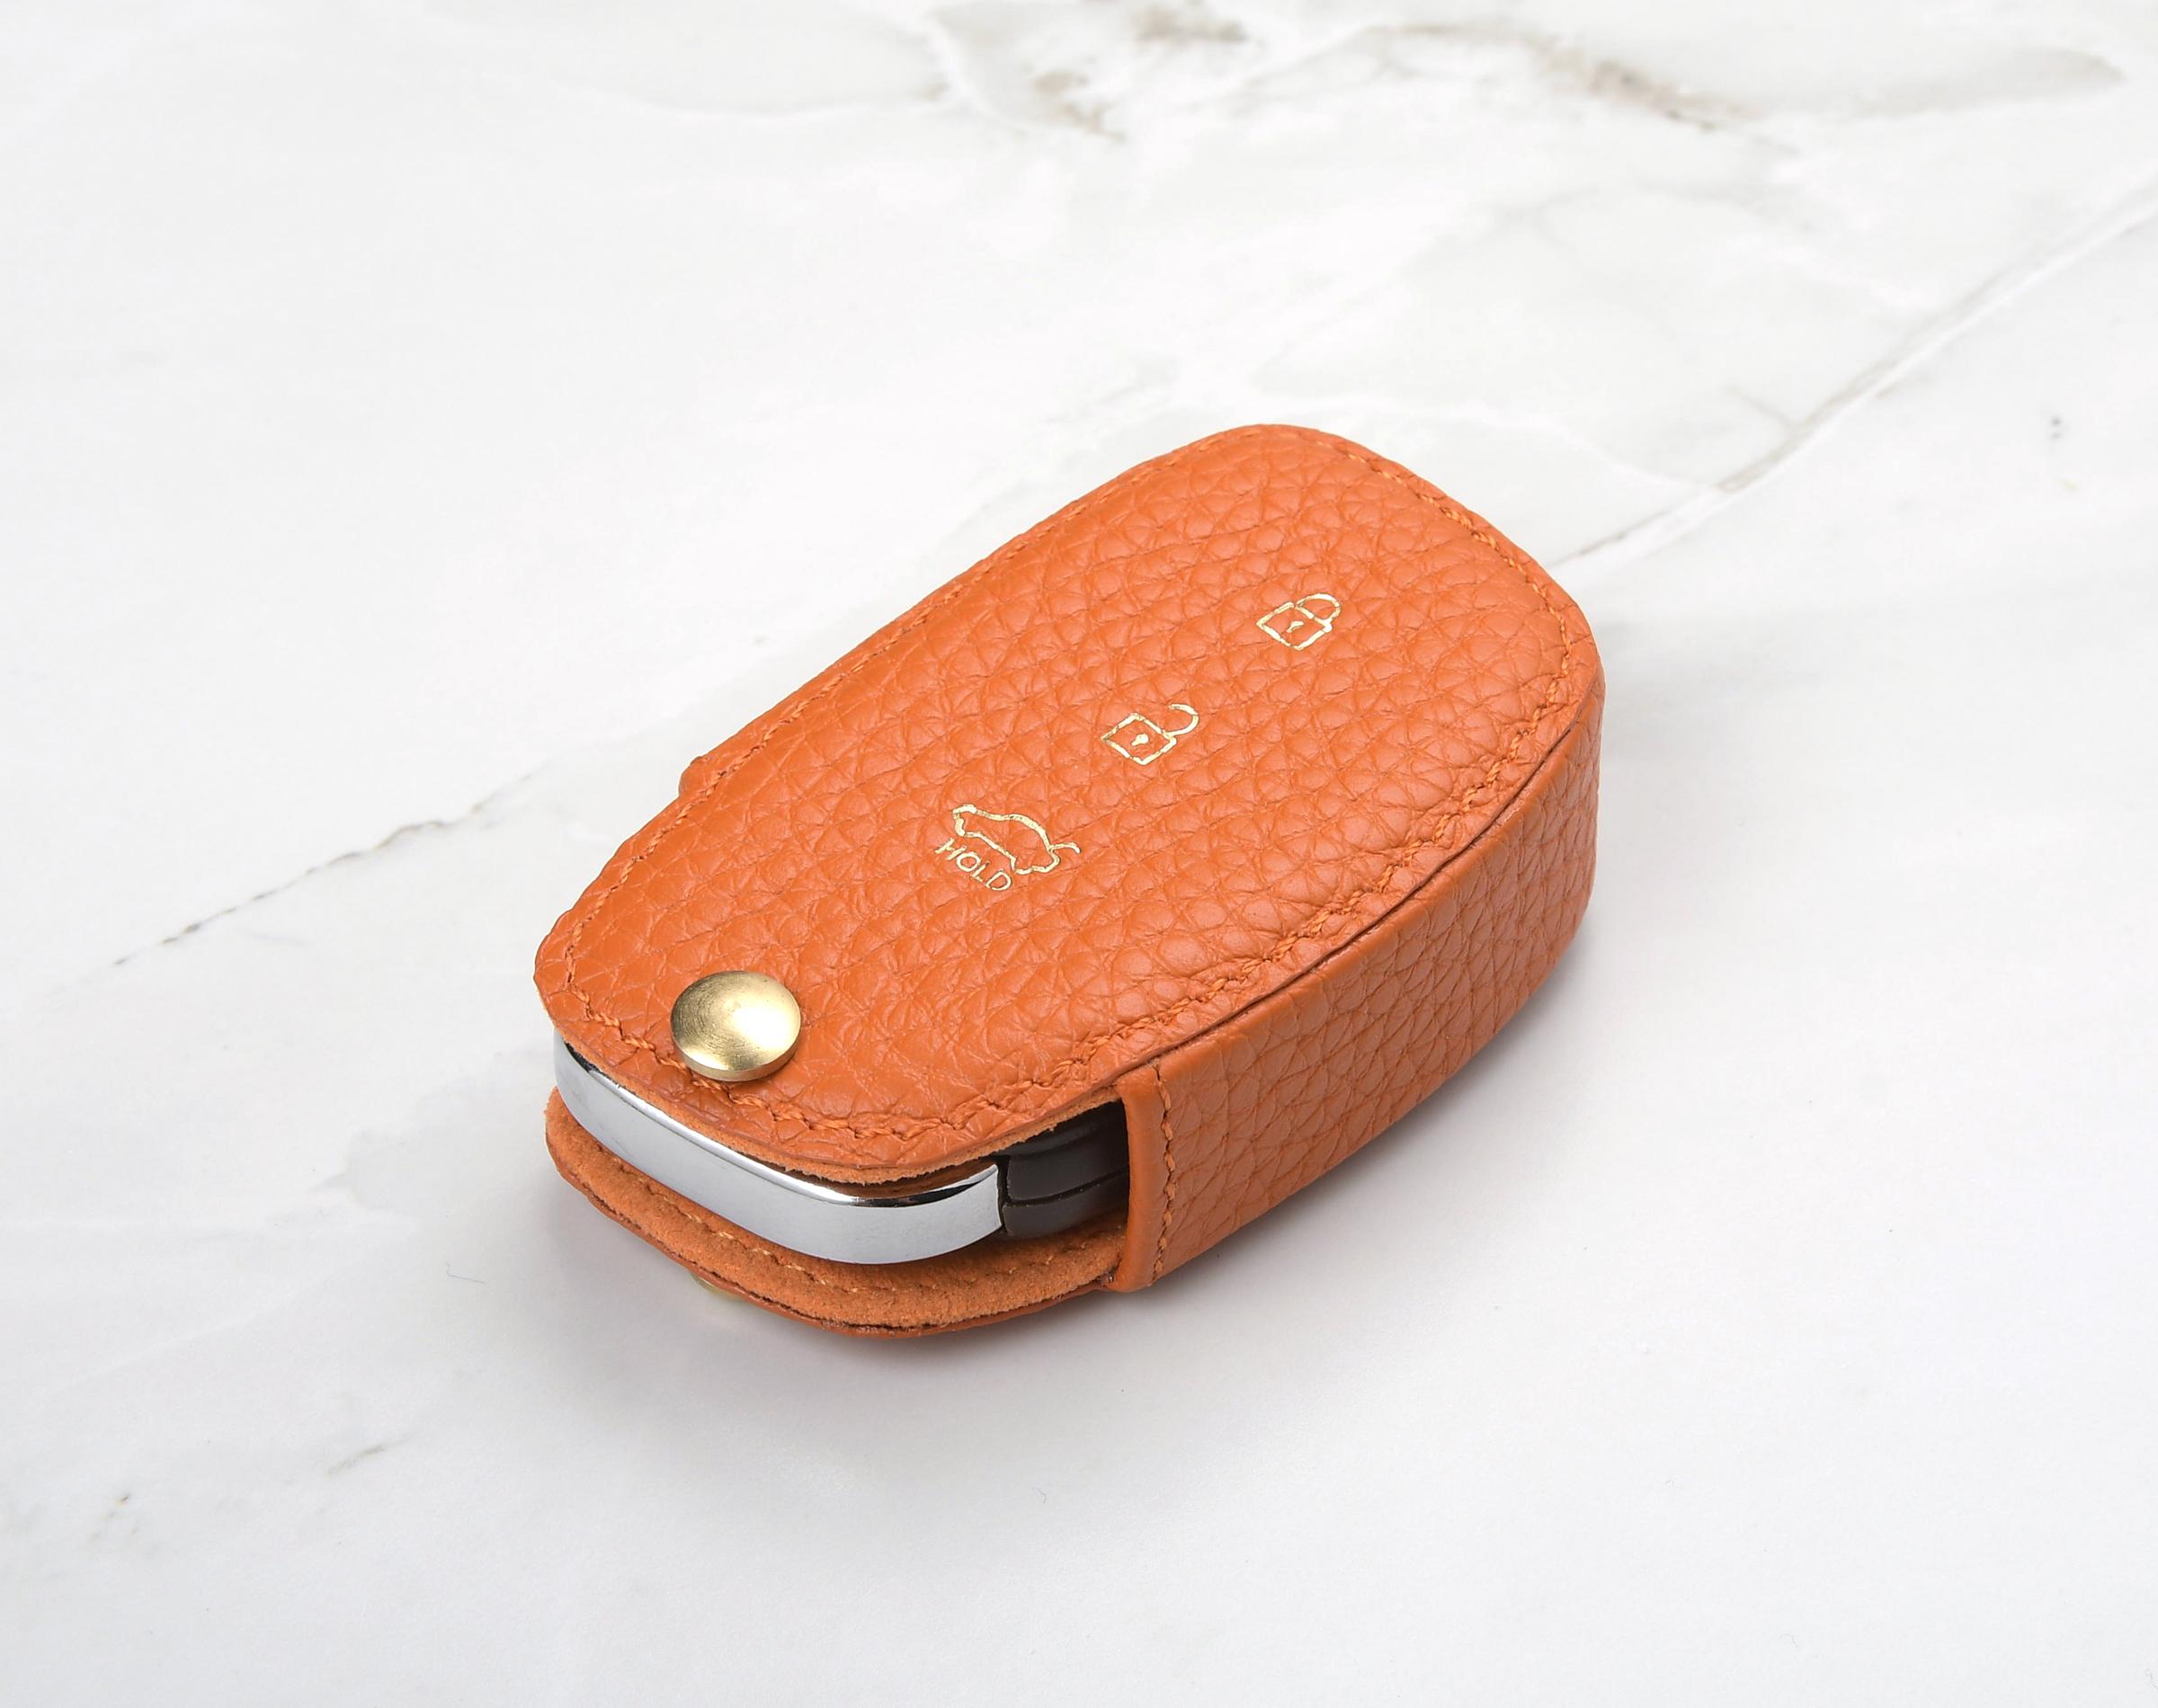 Limited Edition Hyundai Leather Style With Gift Box Logo Keyring Keyfob Hyundai